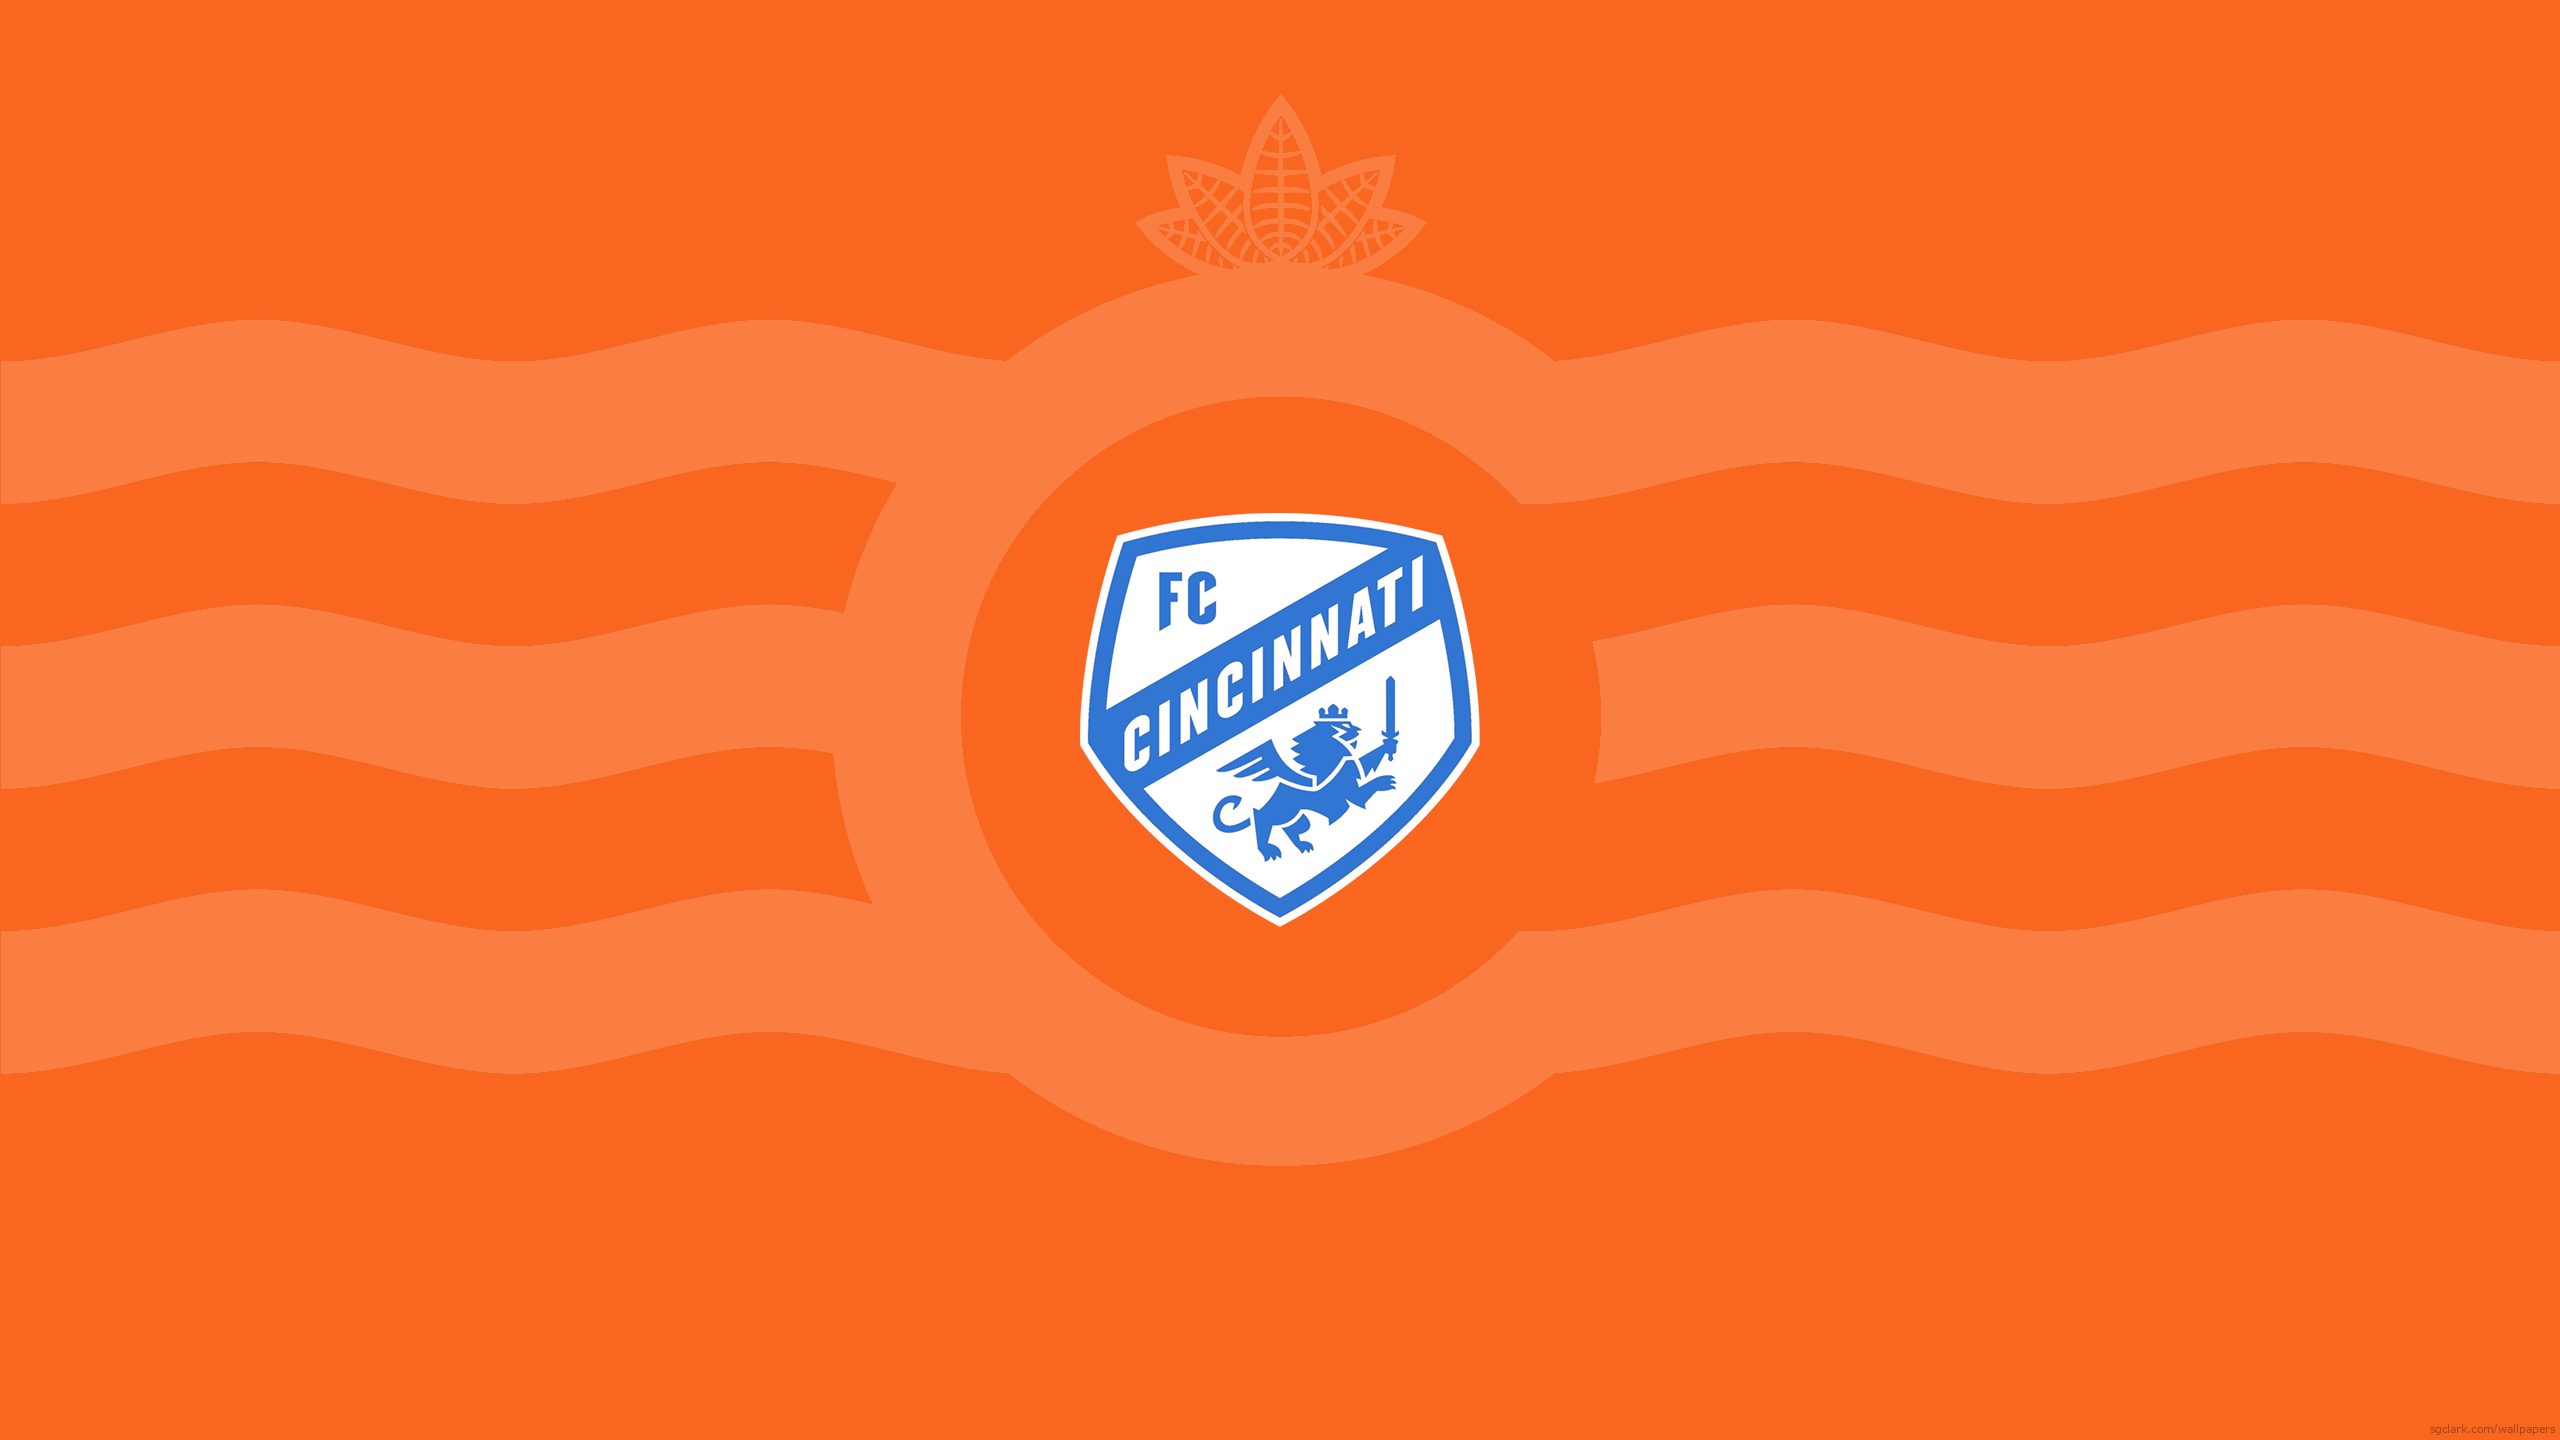 FC Cincinnati (Away)